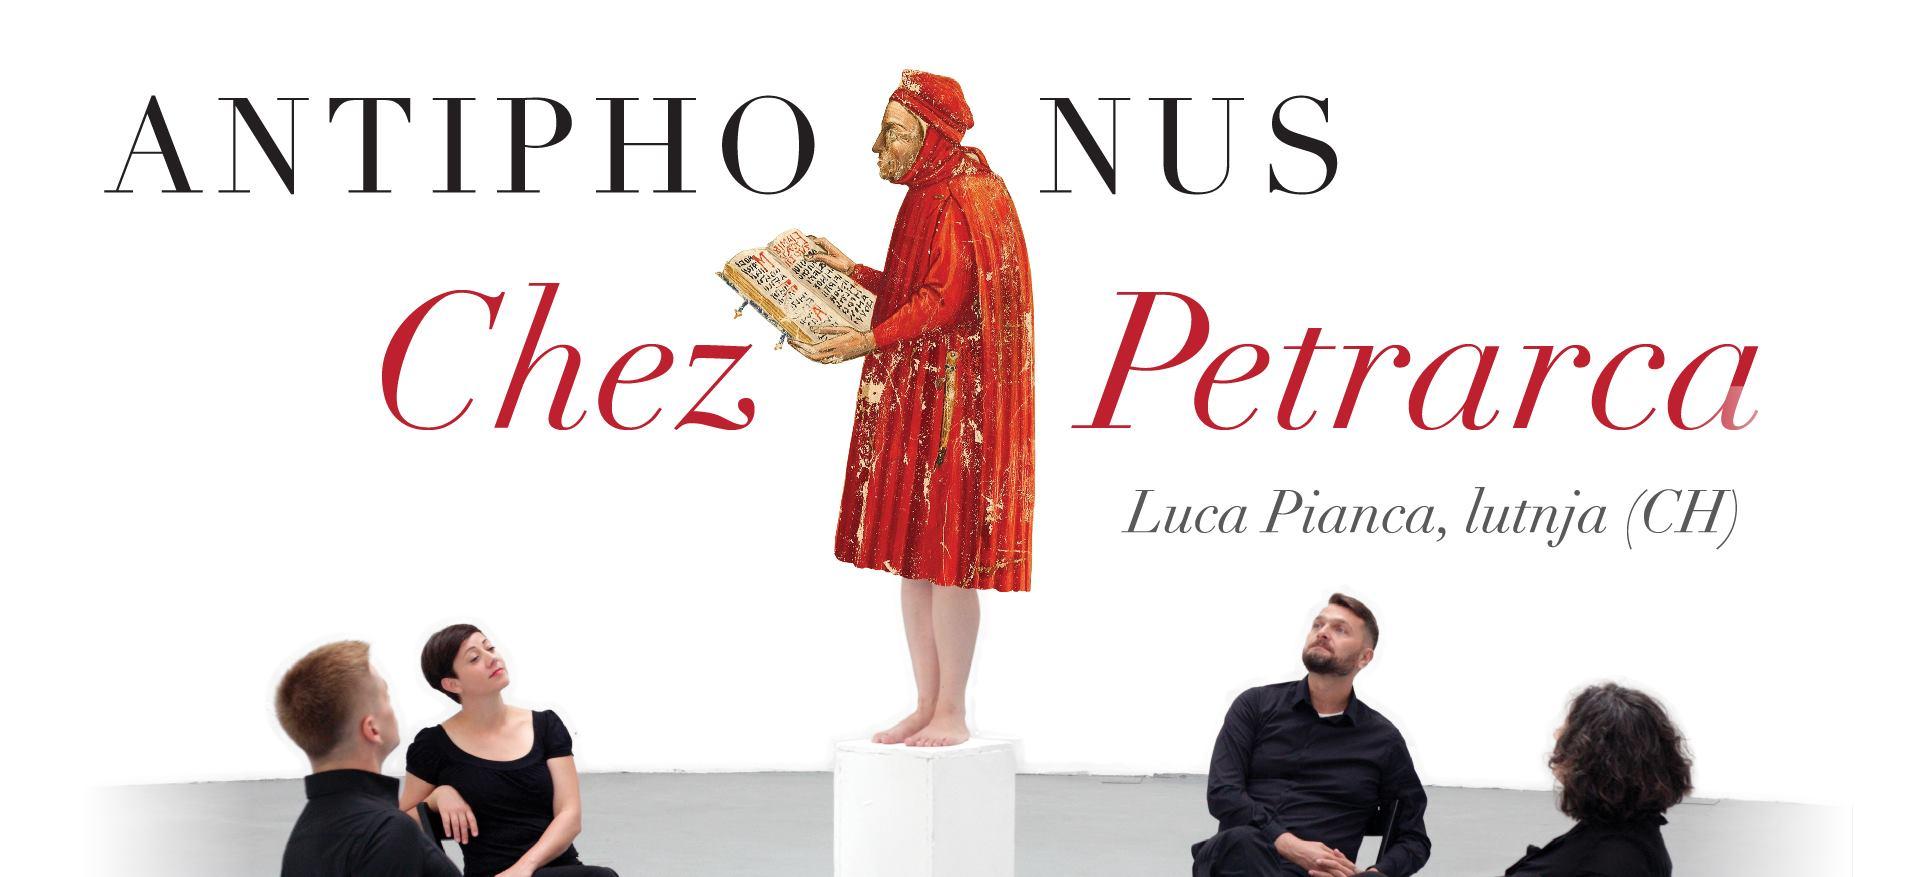 Ansambl Antiphonus otvara ciklus 'Triade' uz gostovanje lutnjista Luce Piance